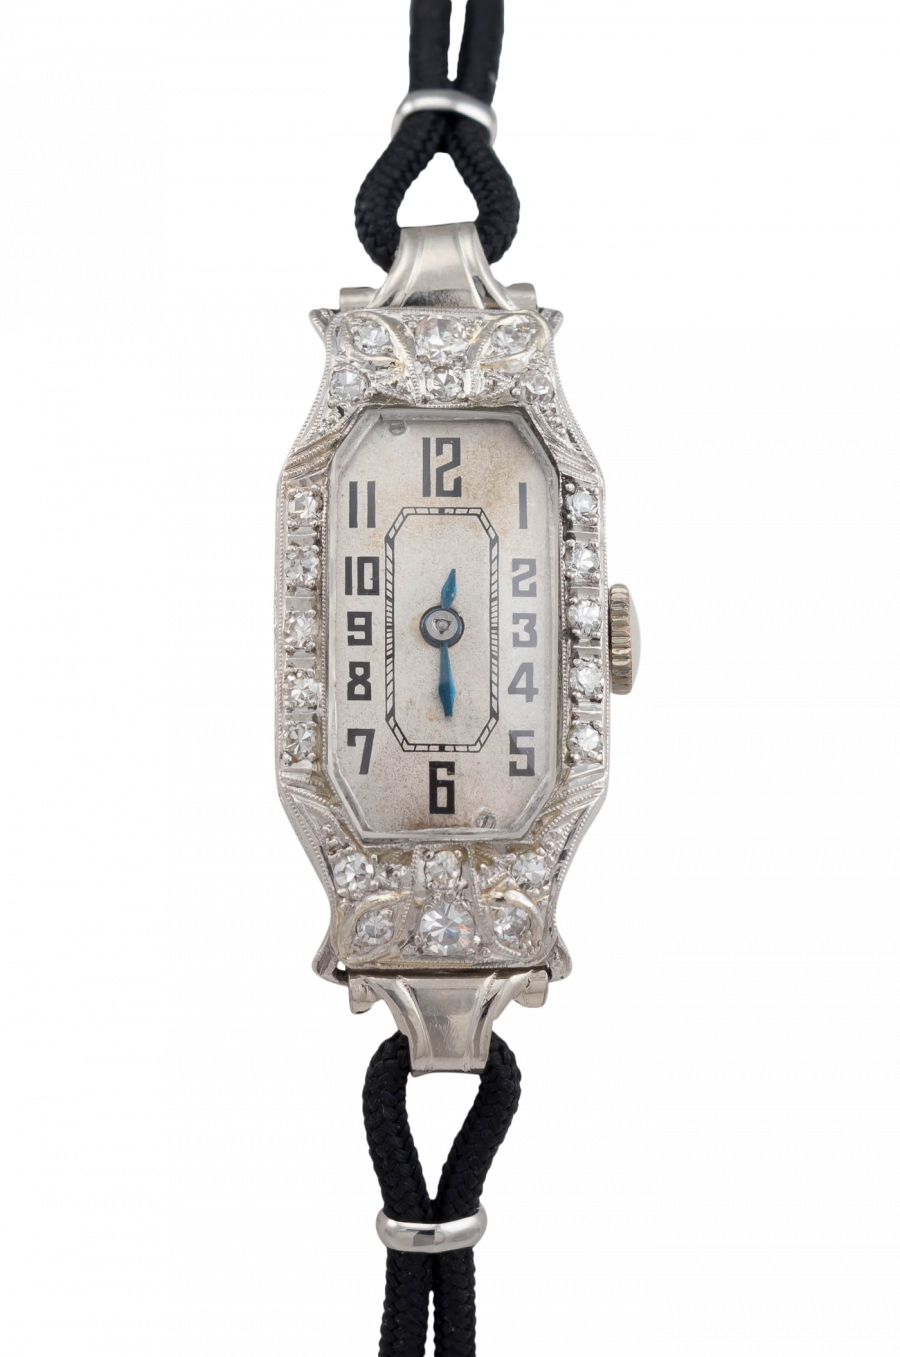 Ladies vintage hamilton wristwatch in platinum with diamonds